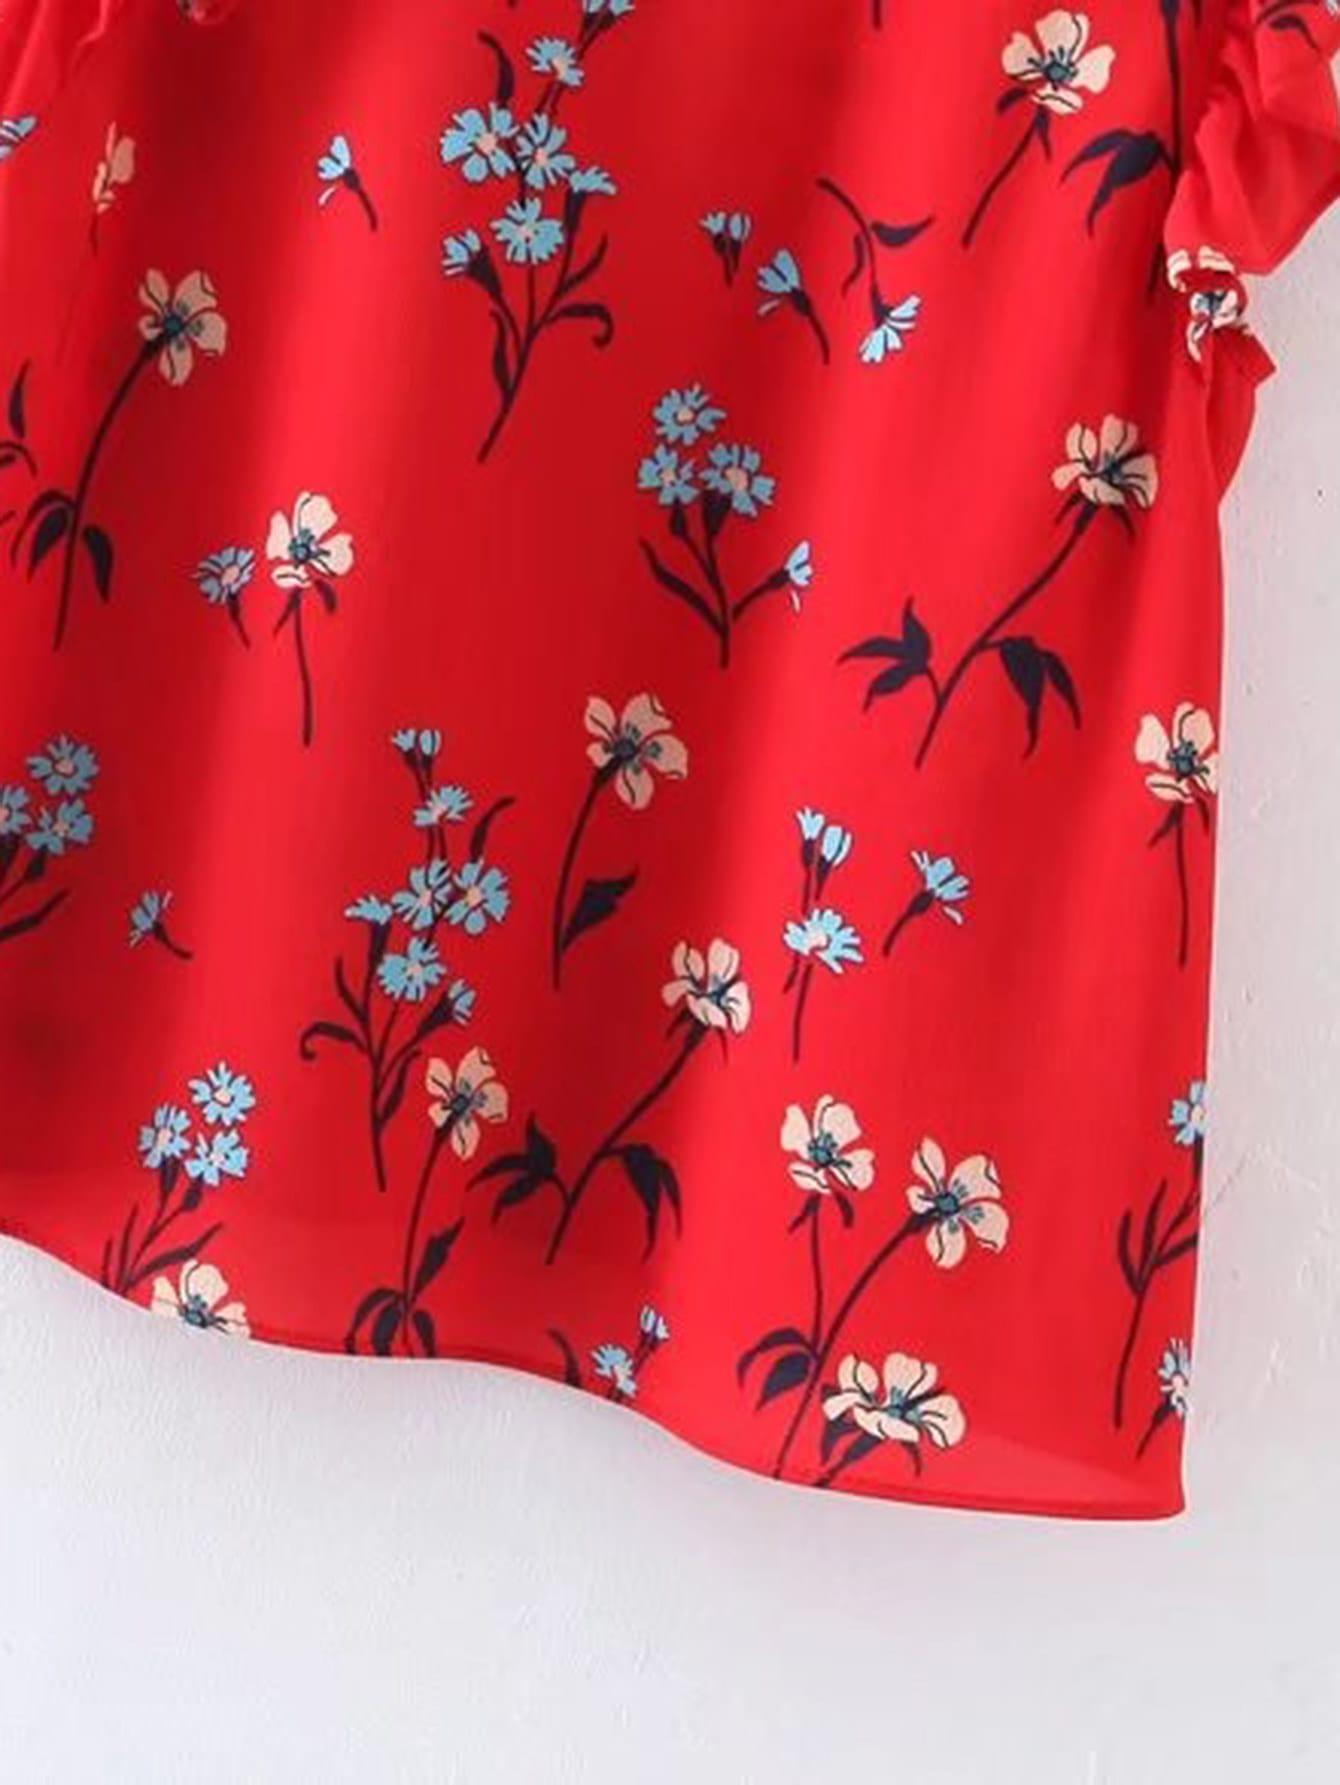 Floral Print Ruffle Trim Tie Back Top